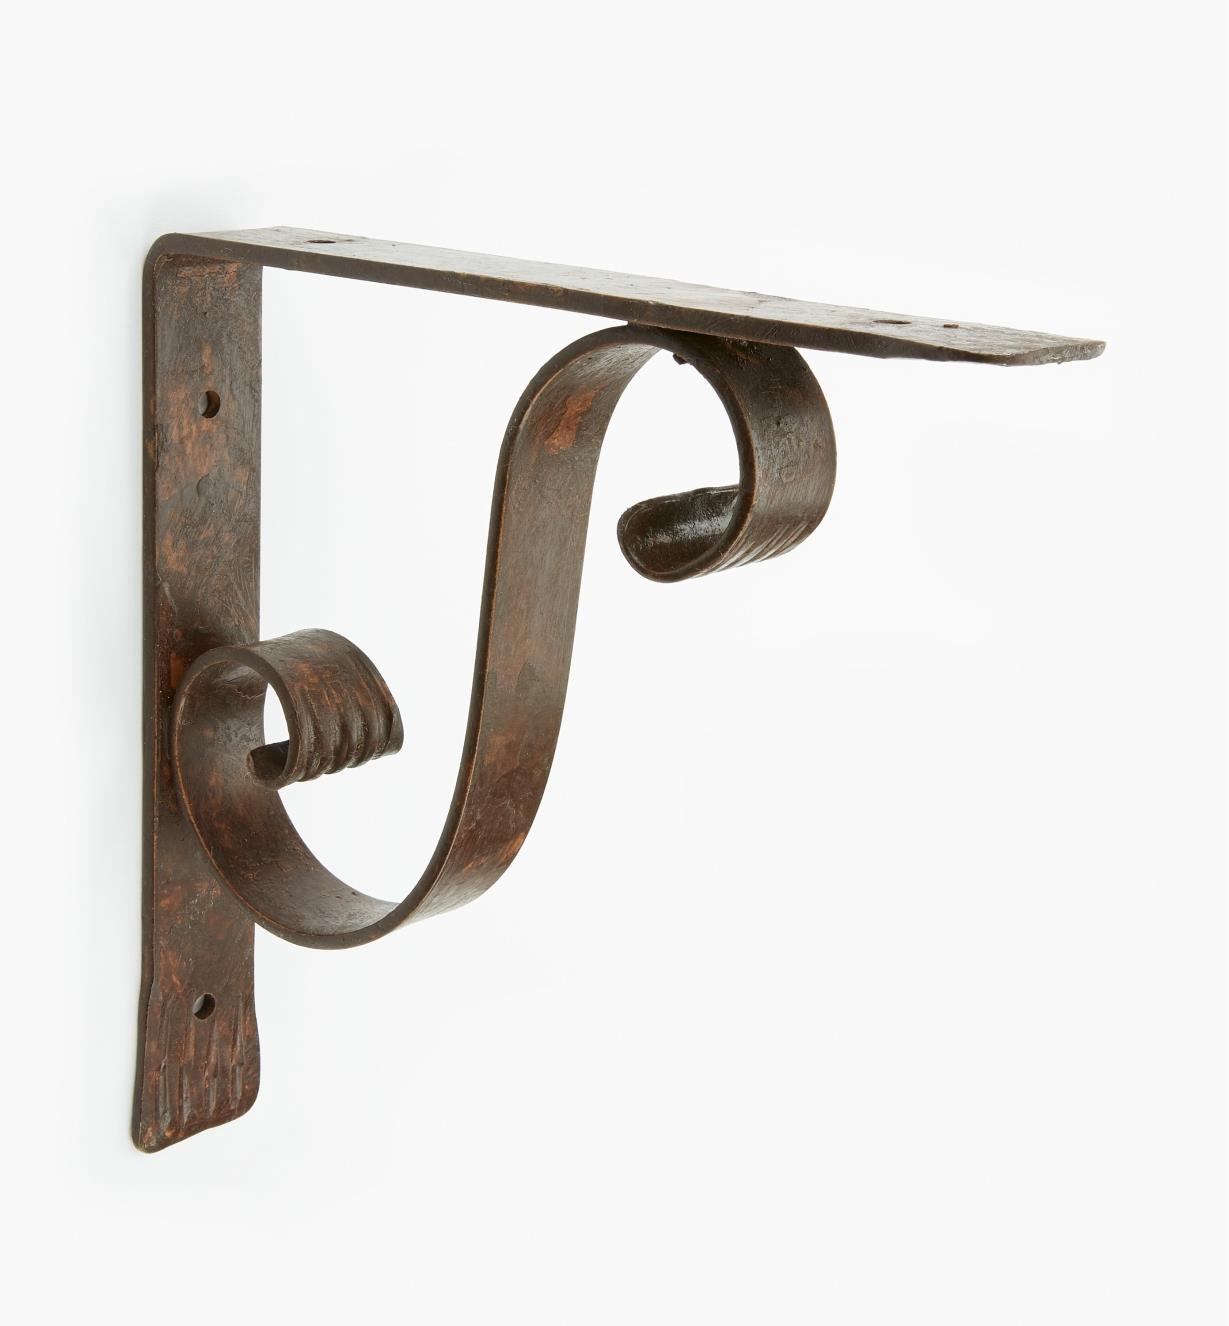 00S2793 - Dark Rust, Scroll, Wrought-Iron Shelf Bracket, each (200mm x 200mm)